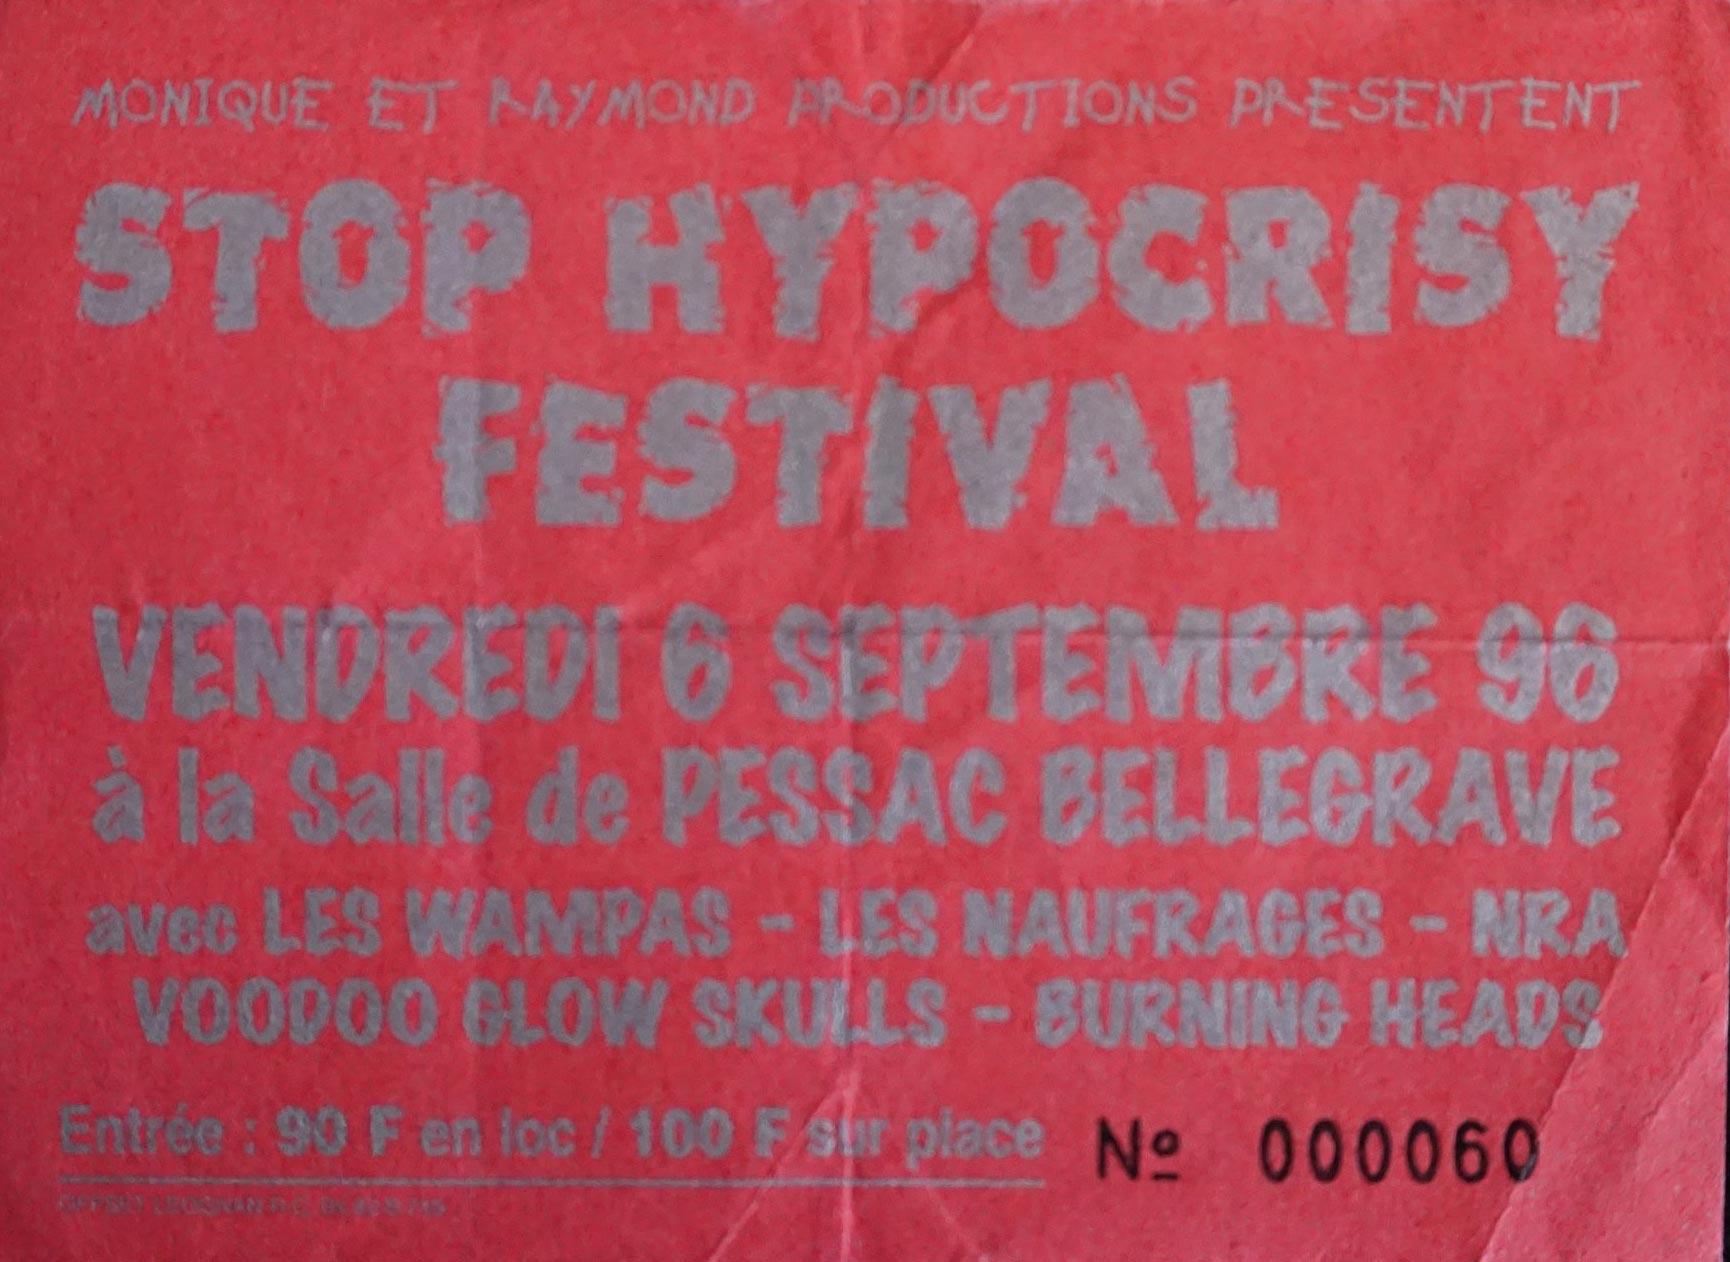 "6 septembre 1996 La Ruda Salska, les Naufragés, Burning Heads, Seven Hate, NRA, Voodoo Glow Skulls, les Wampas à Pessac ""Salle Bellegrave"""